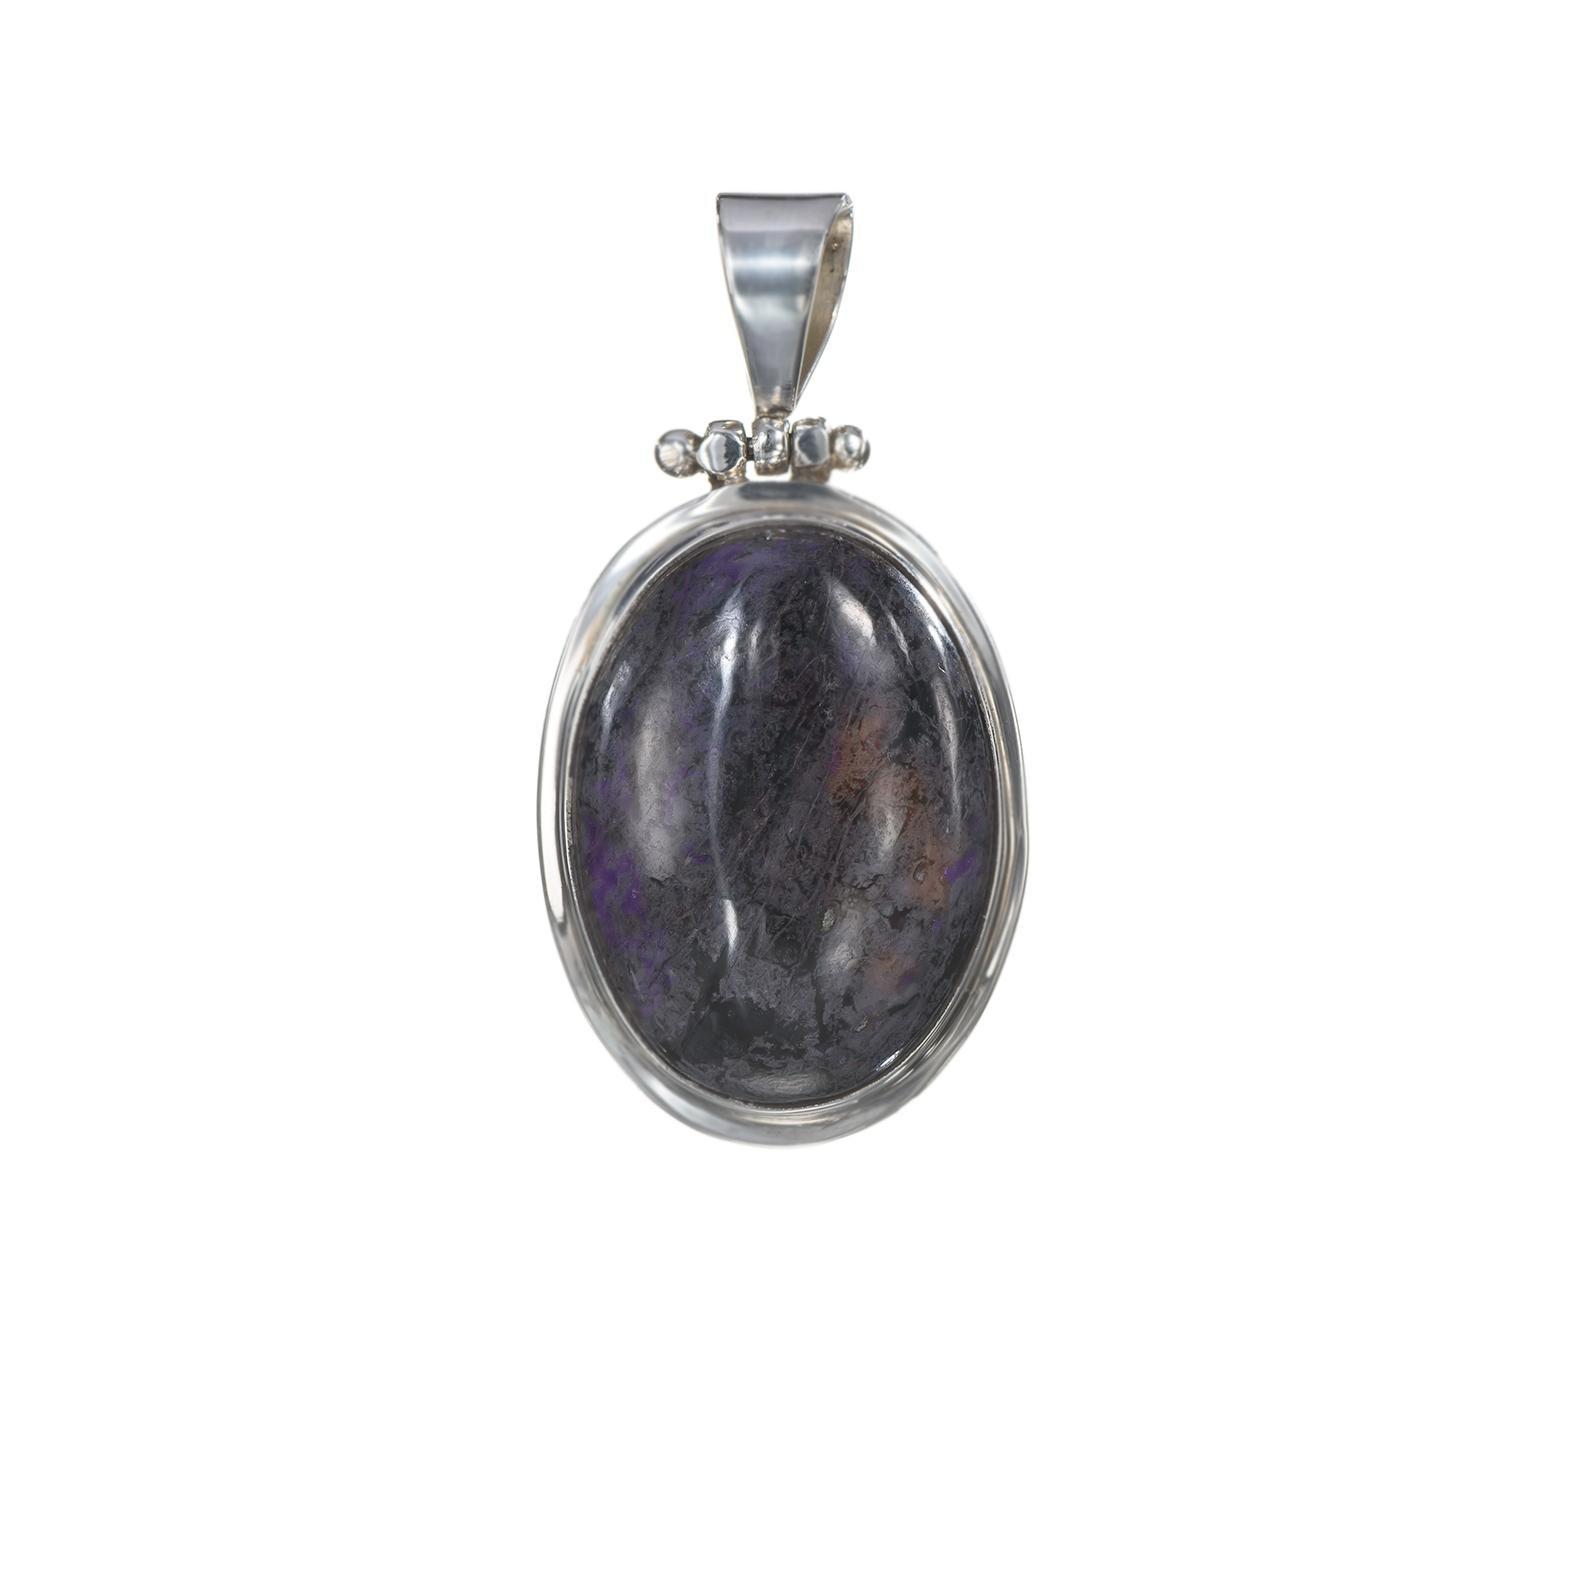 Vintage Lavender Agate Pendant